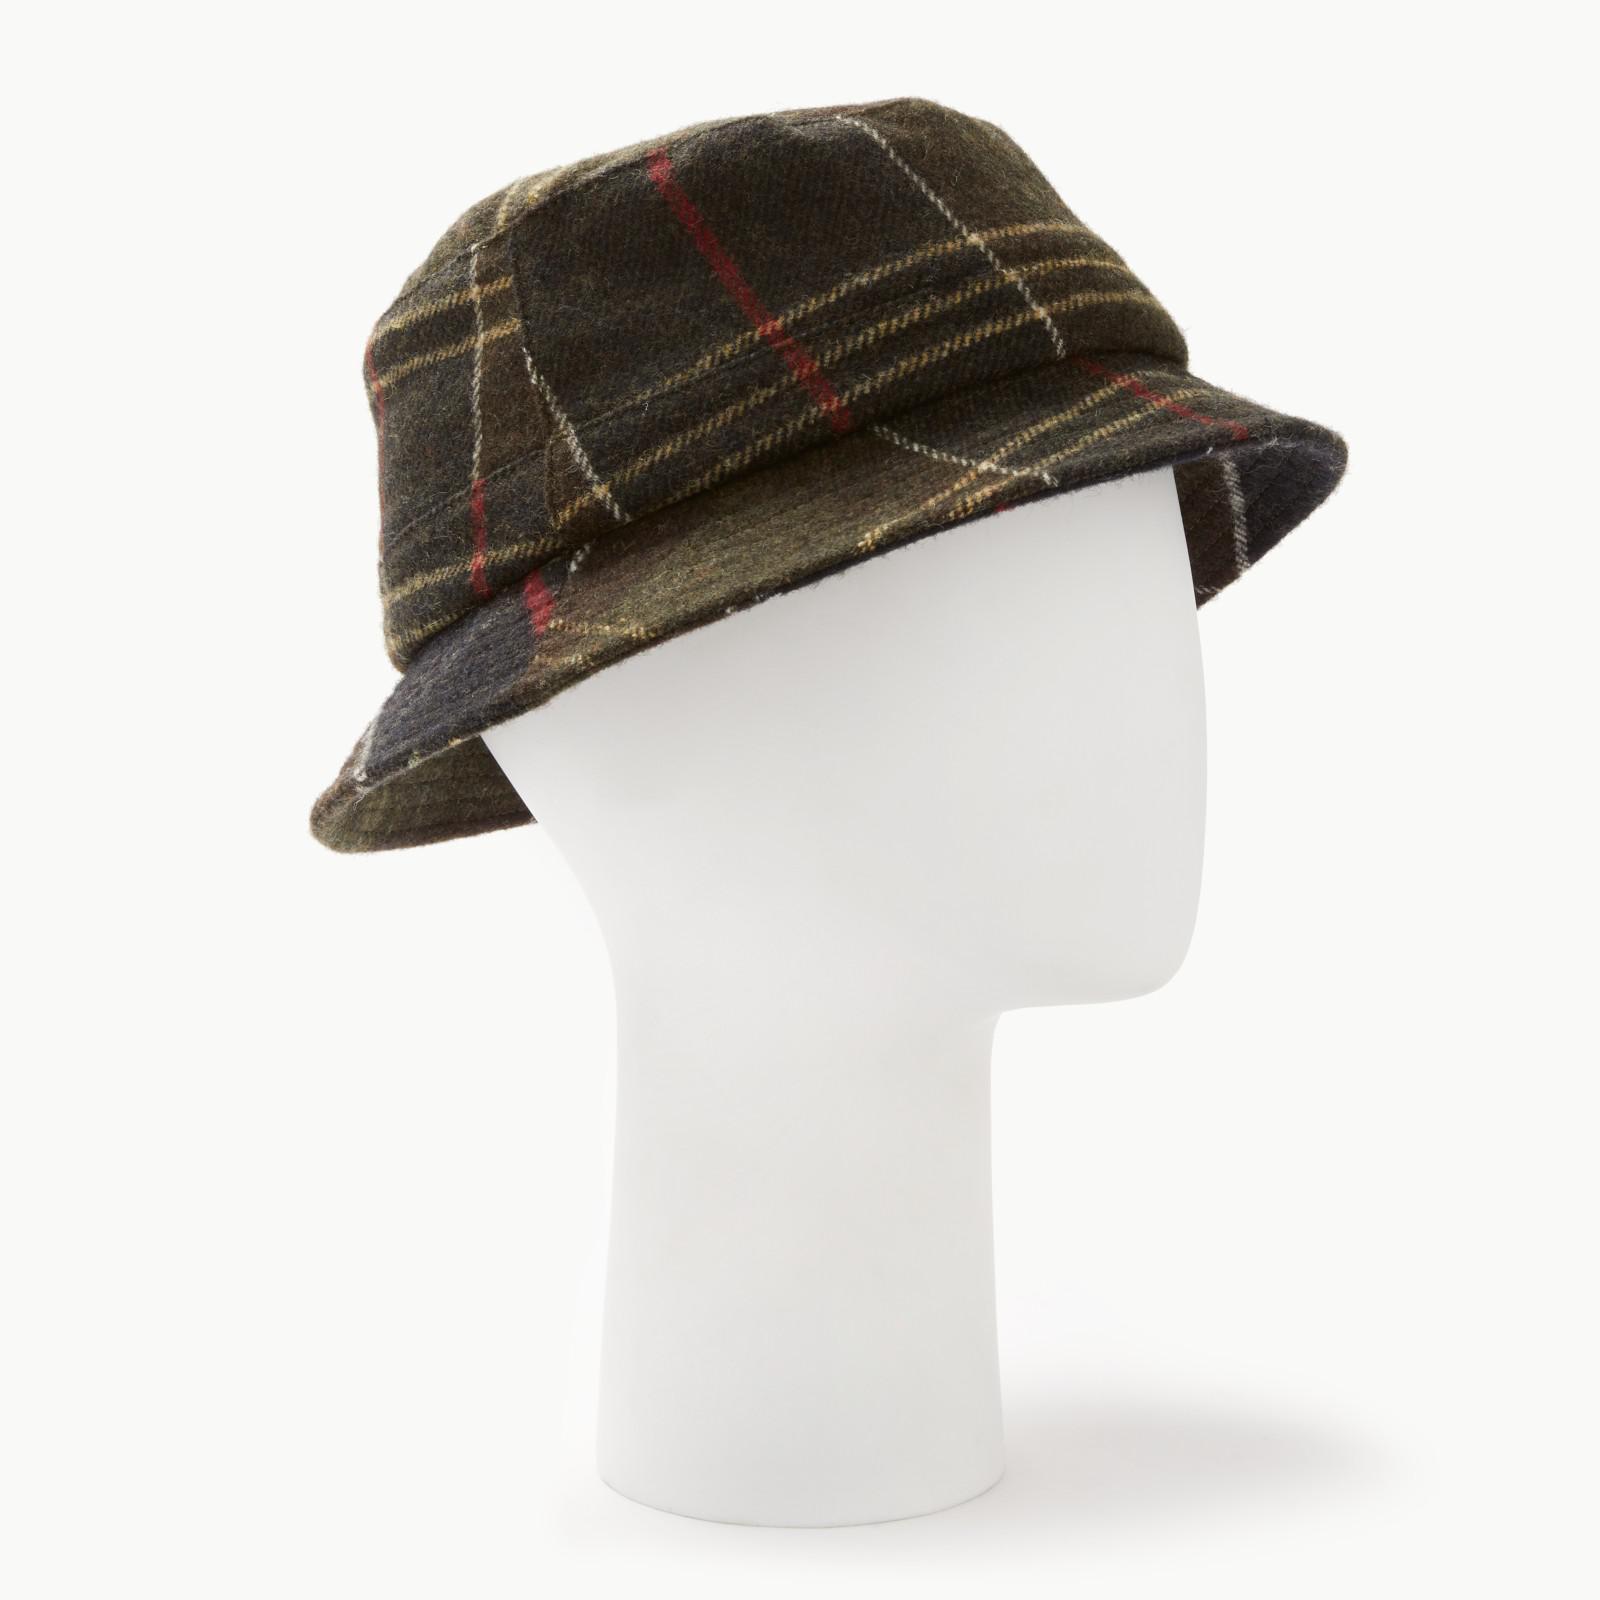 33242e109fda1 Barbour Galloway Tartan Bucket Hat in Green - Lyst